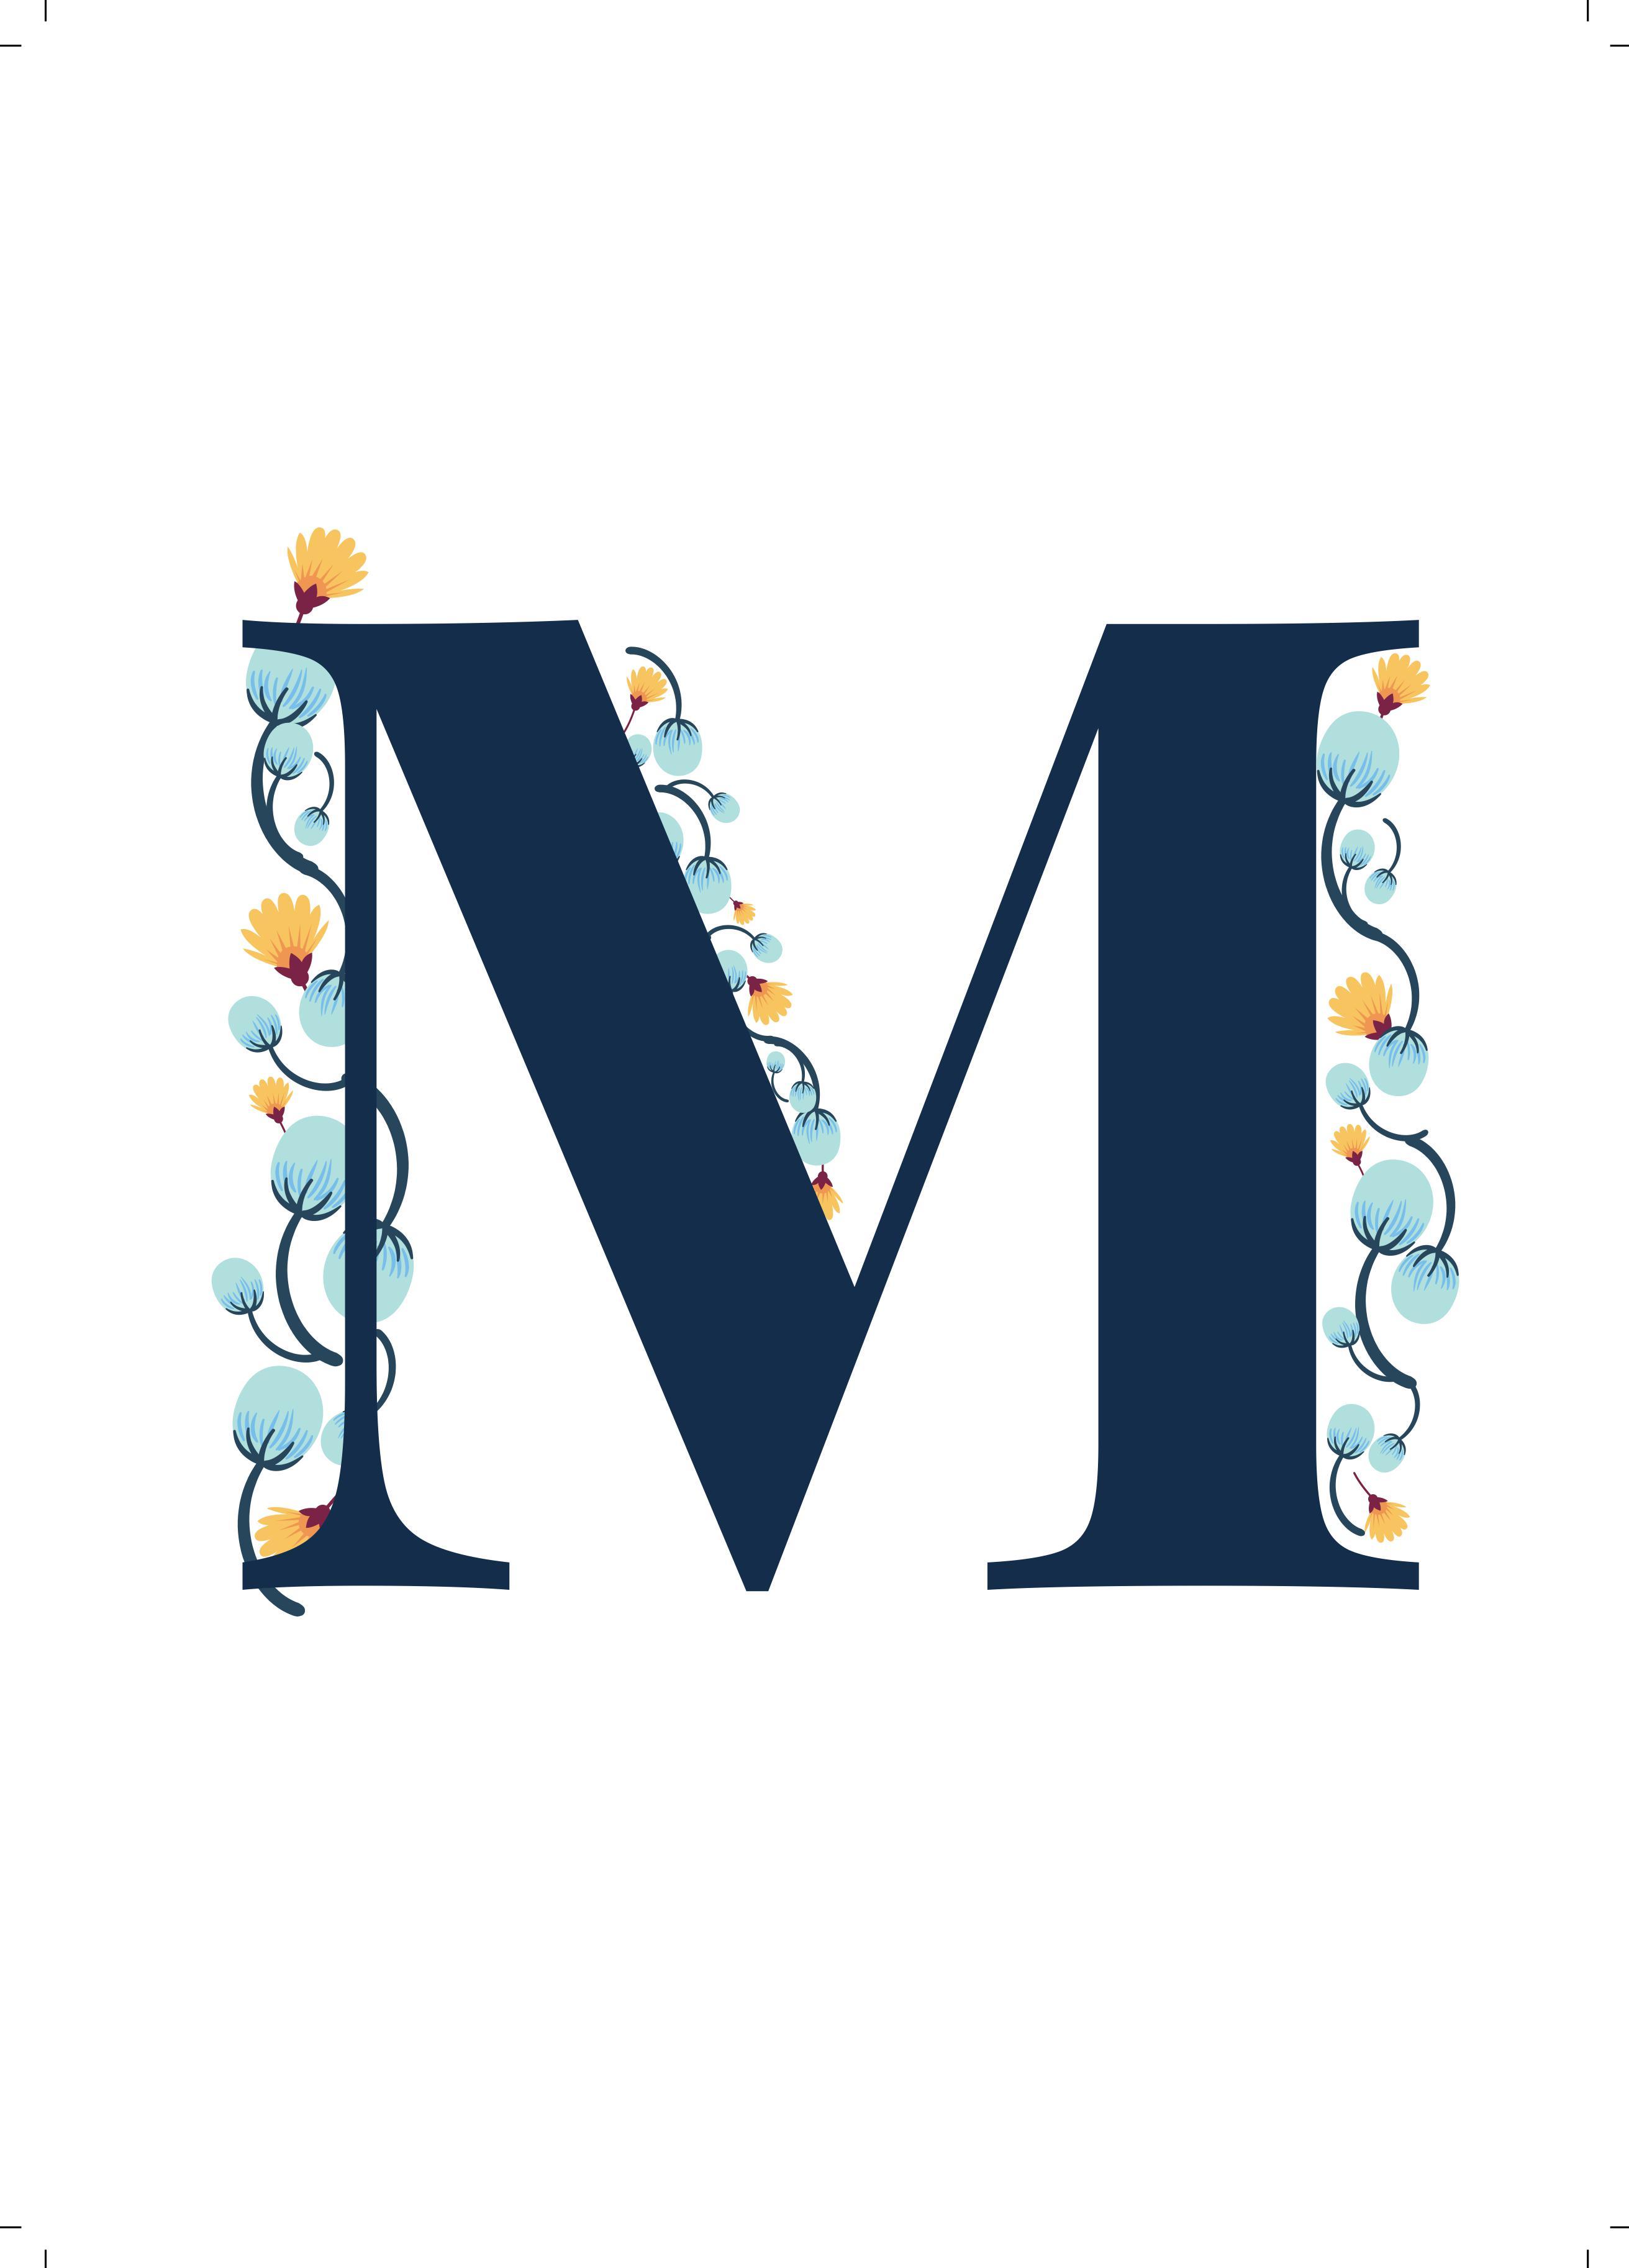 MAMA-Fotostrecke zum Muttertag, Freebie zum Downloaden